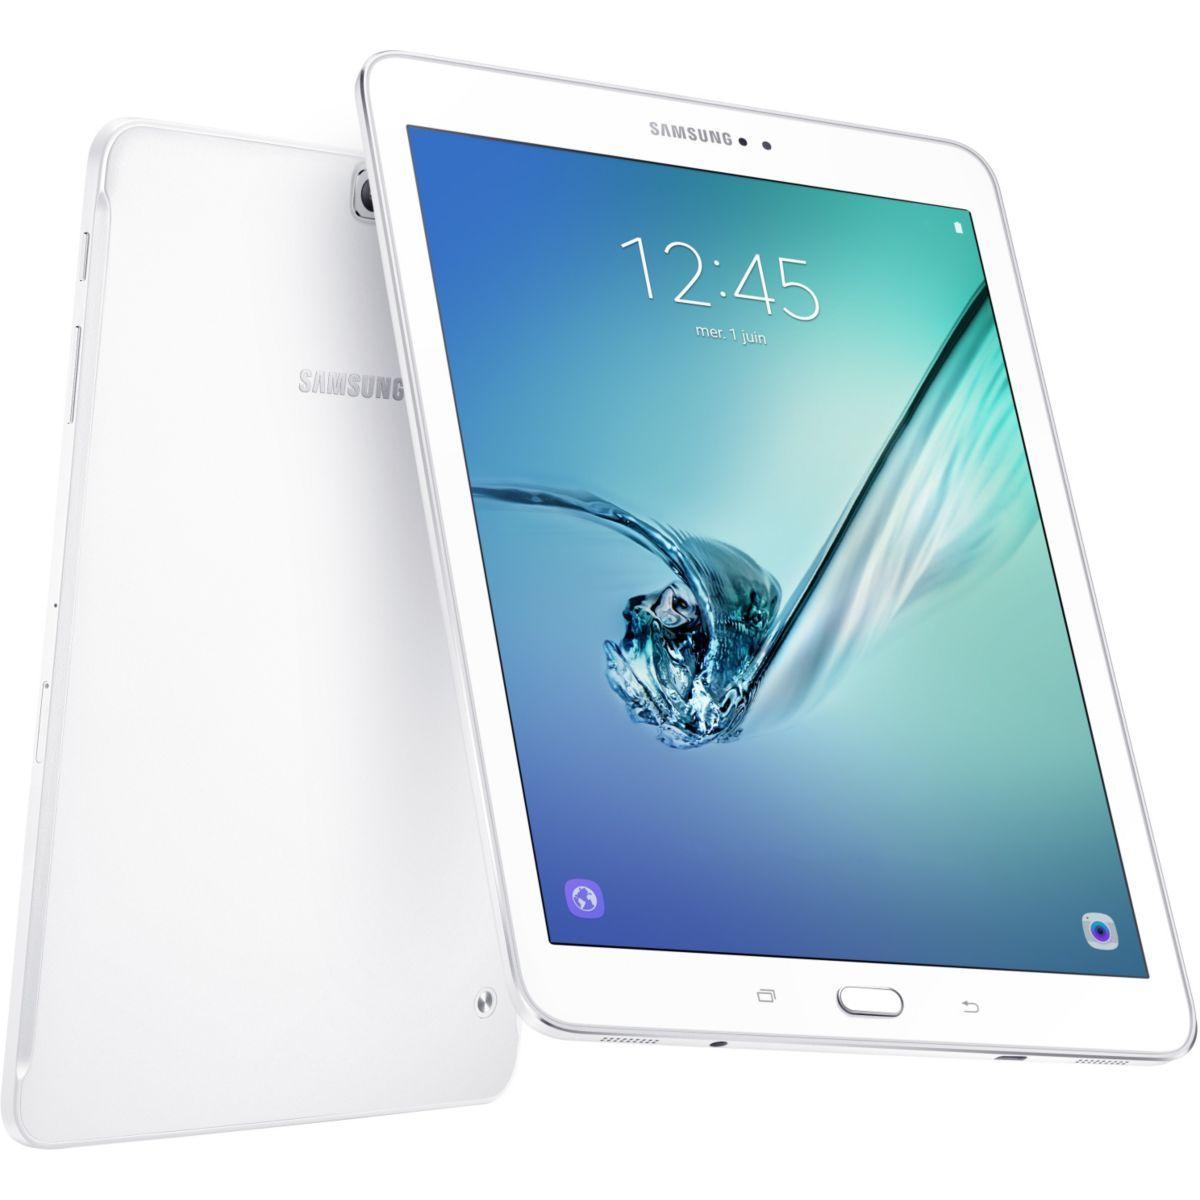 Galaxy Tab S2 (2015) - WiFi + 4G